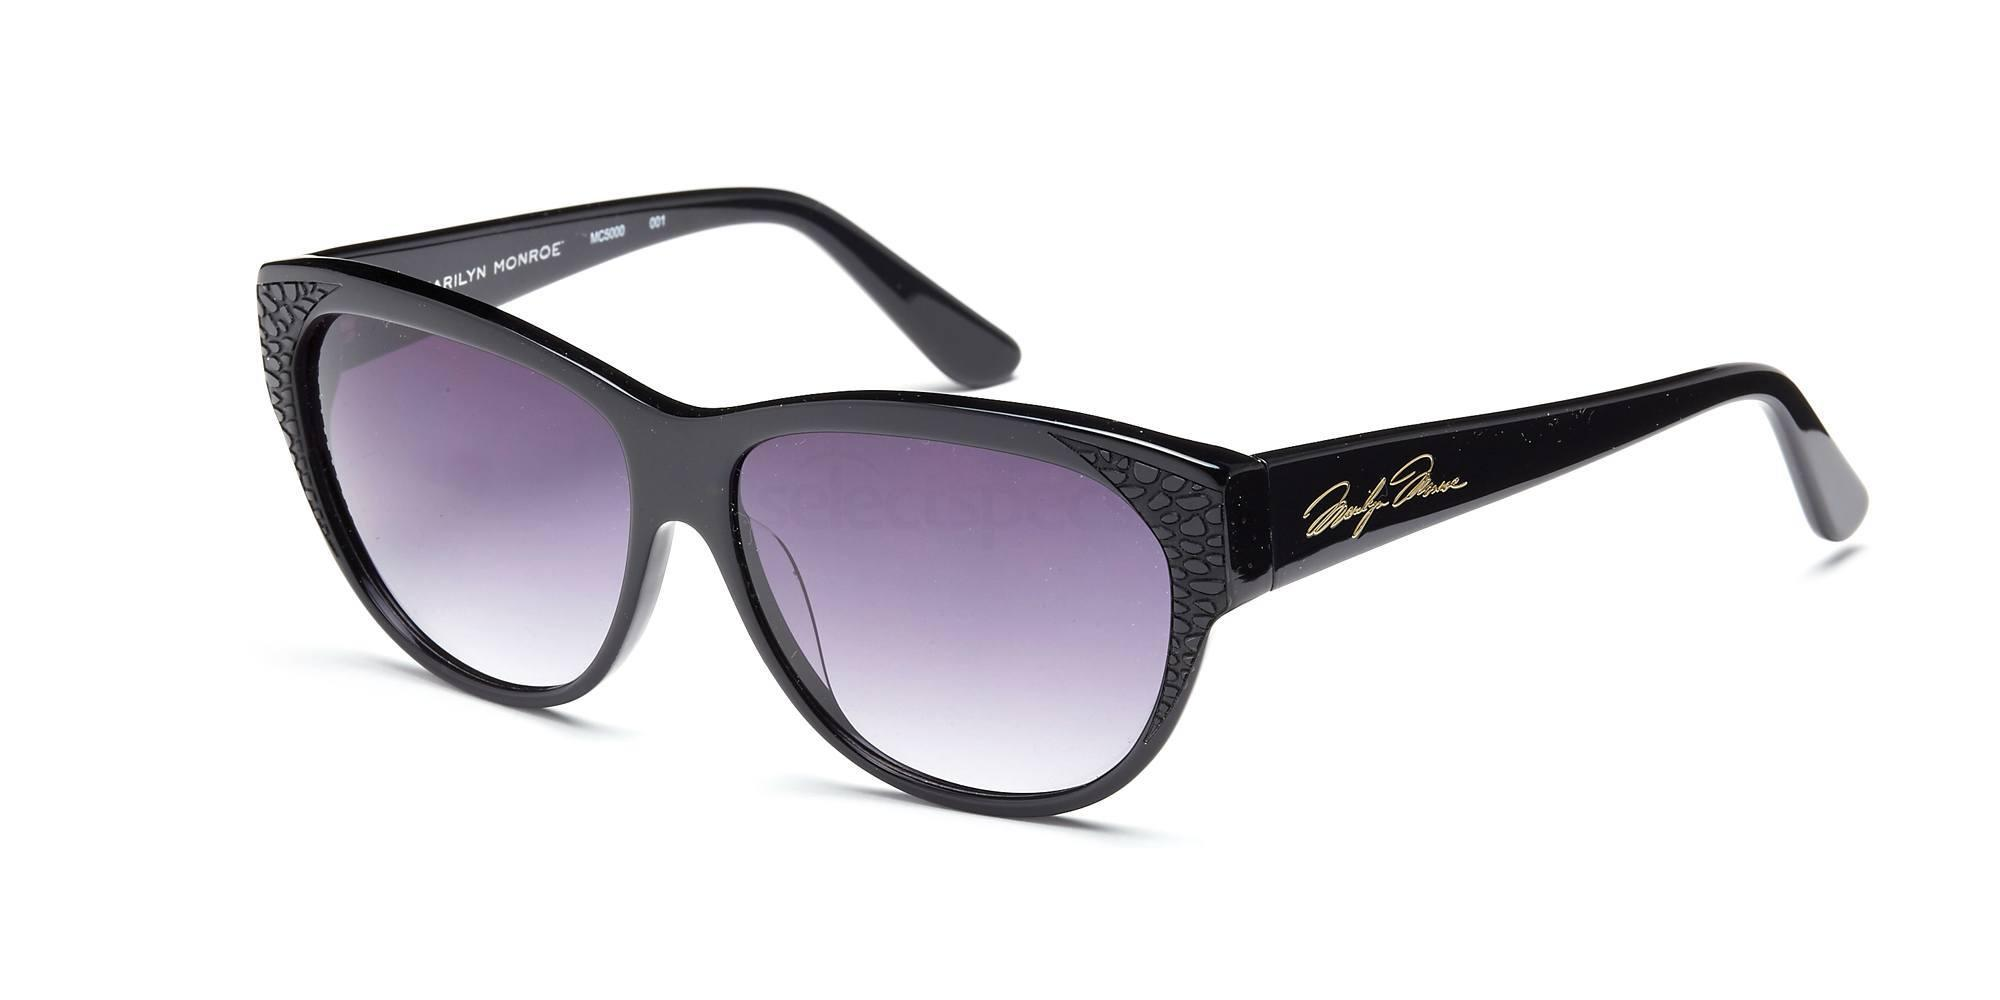 C1 MMS5000 Sunglasses, Marilyn Monroe